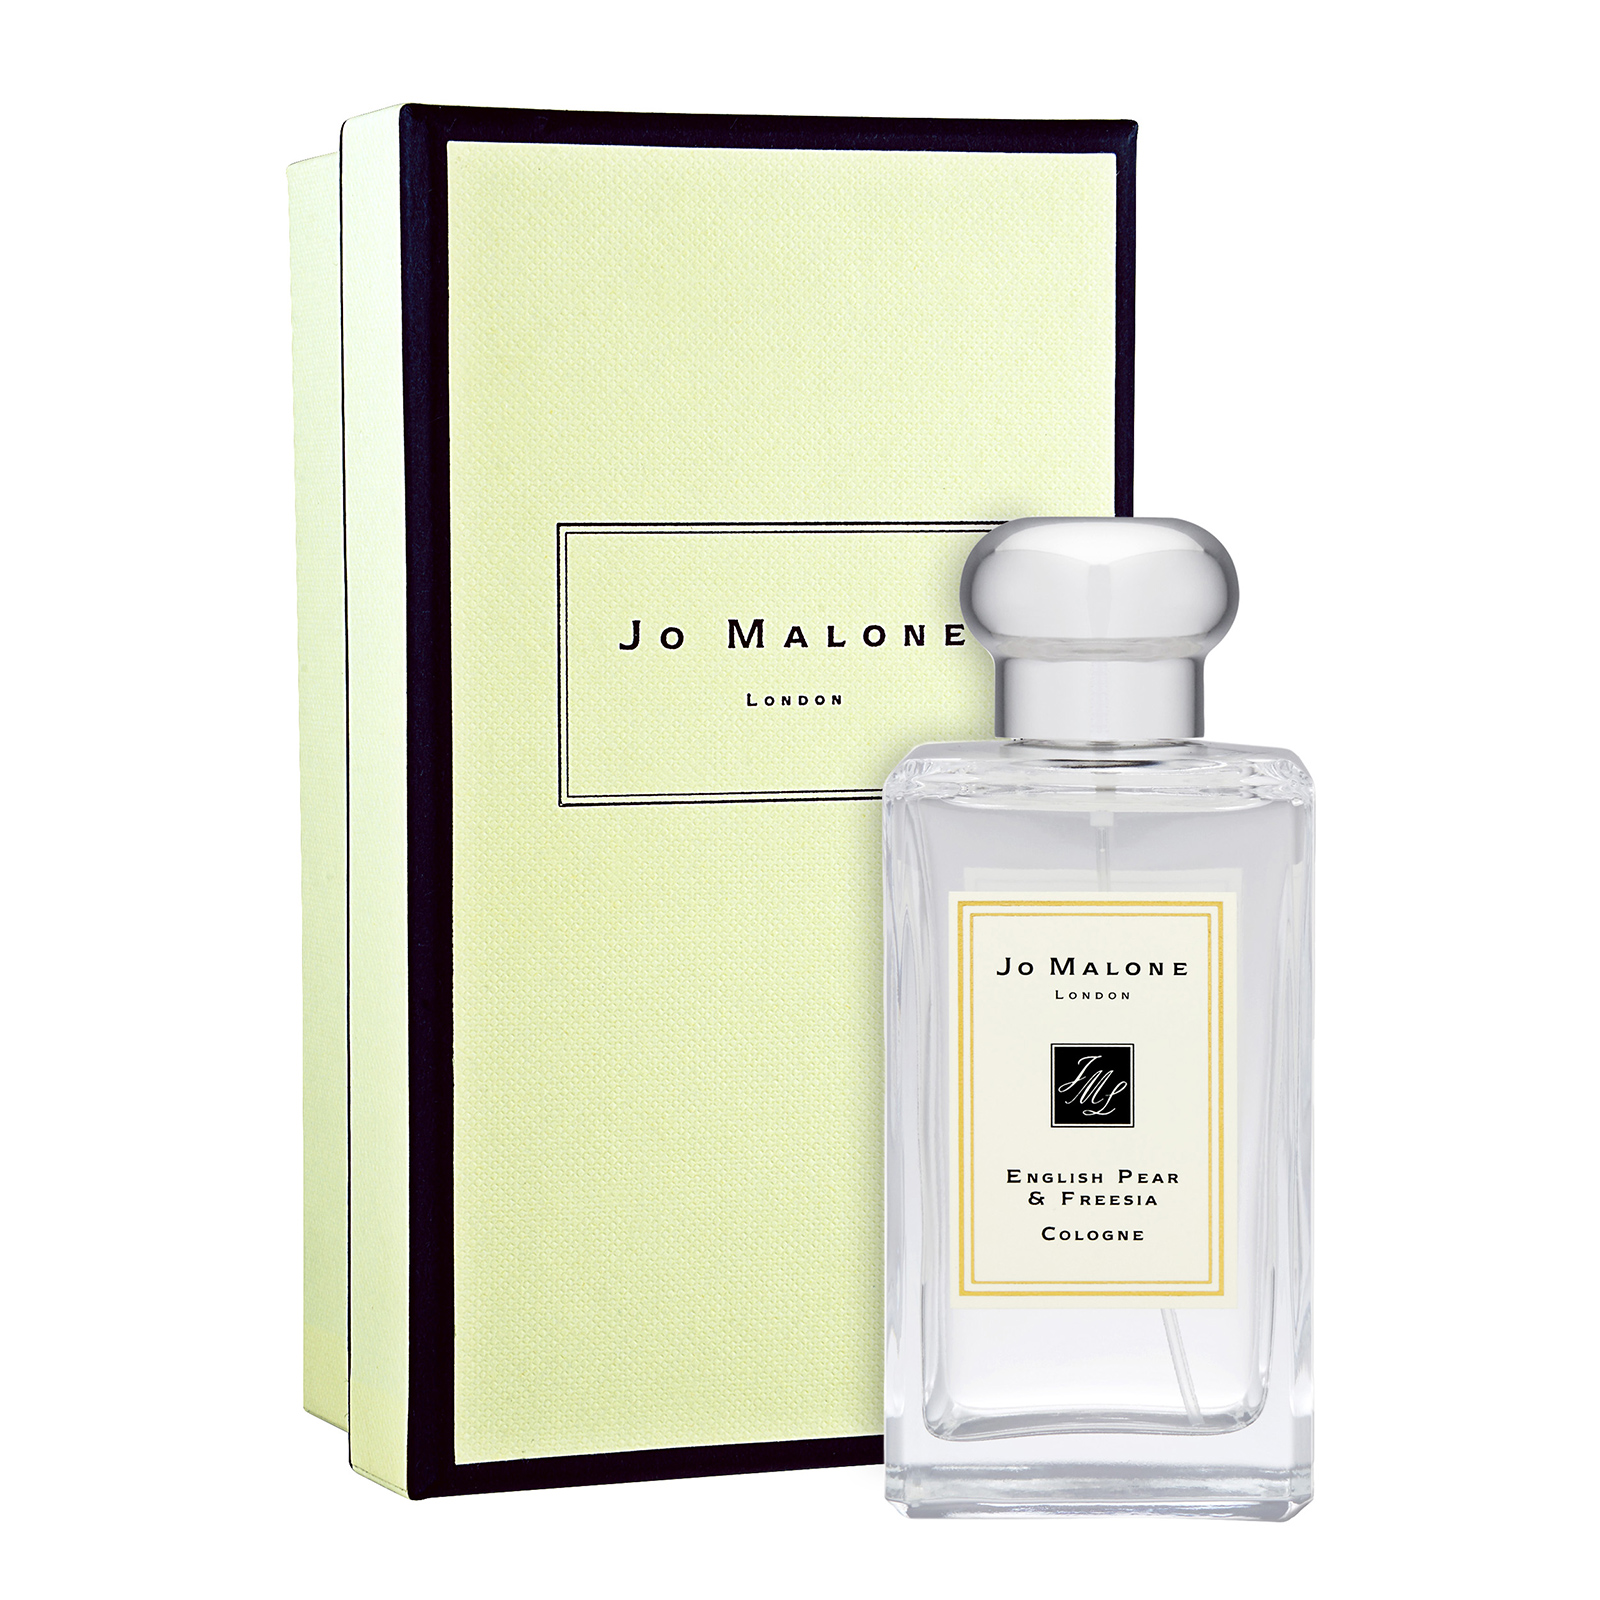 e08158f21d31a Details about Jo Malone English Pear   Freesia Cologne 3.4oz